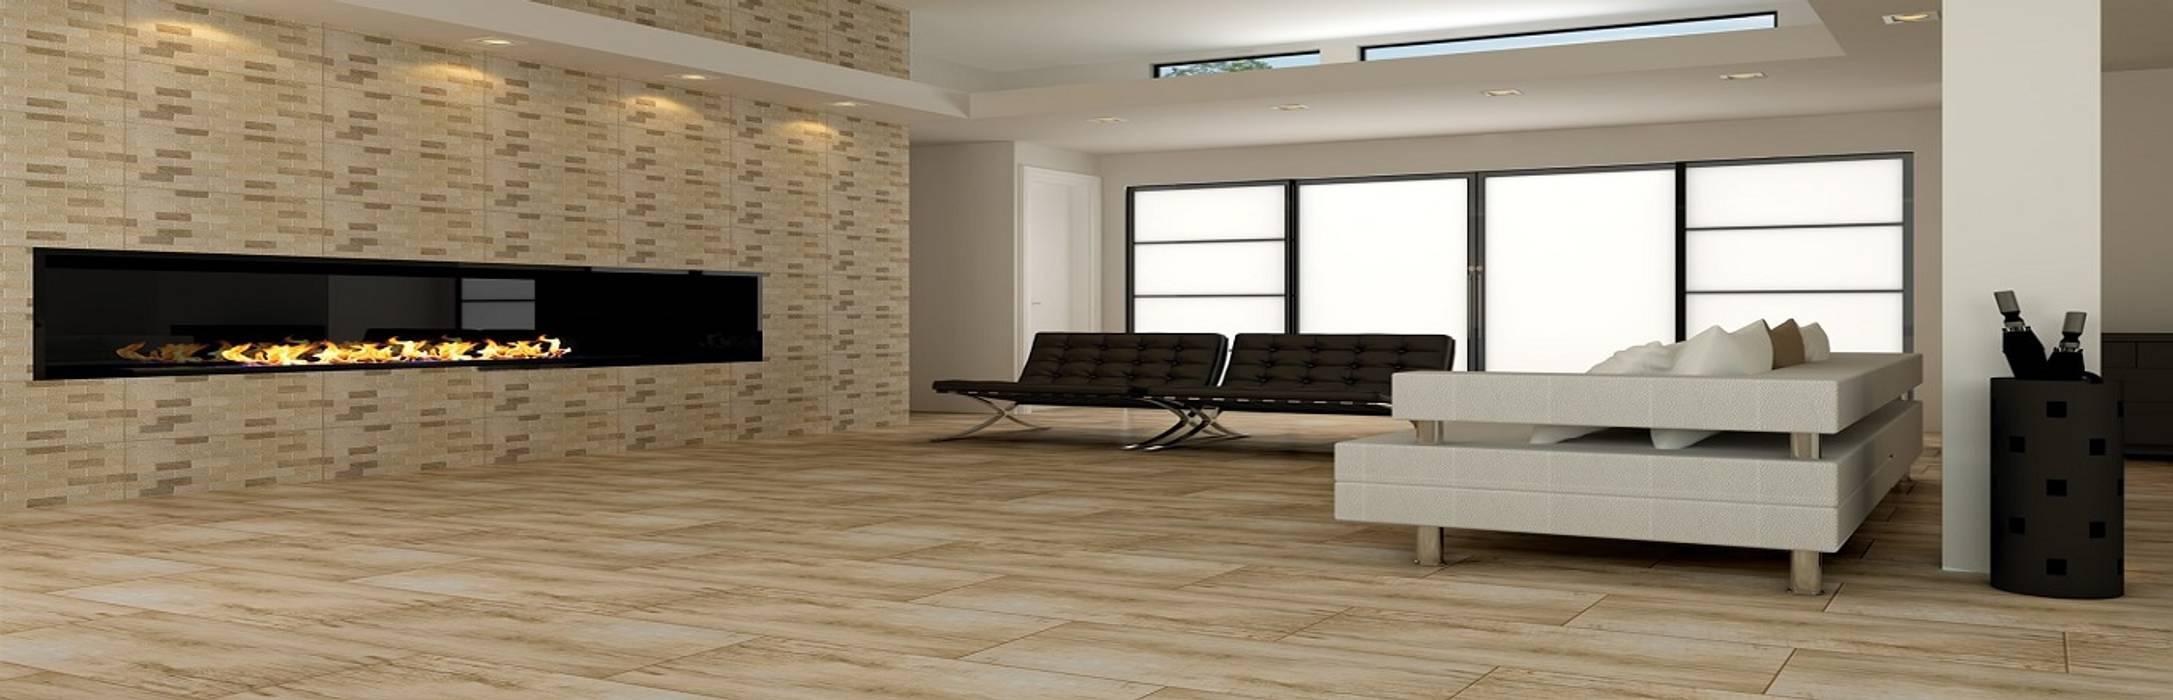 Porcelain Floor Tiles From india by Tiles Carrelage Pvt. Ltd. Asian